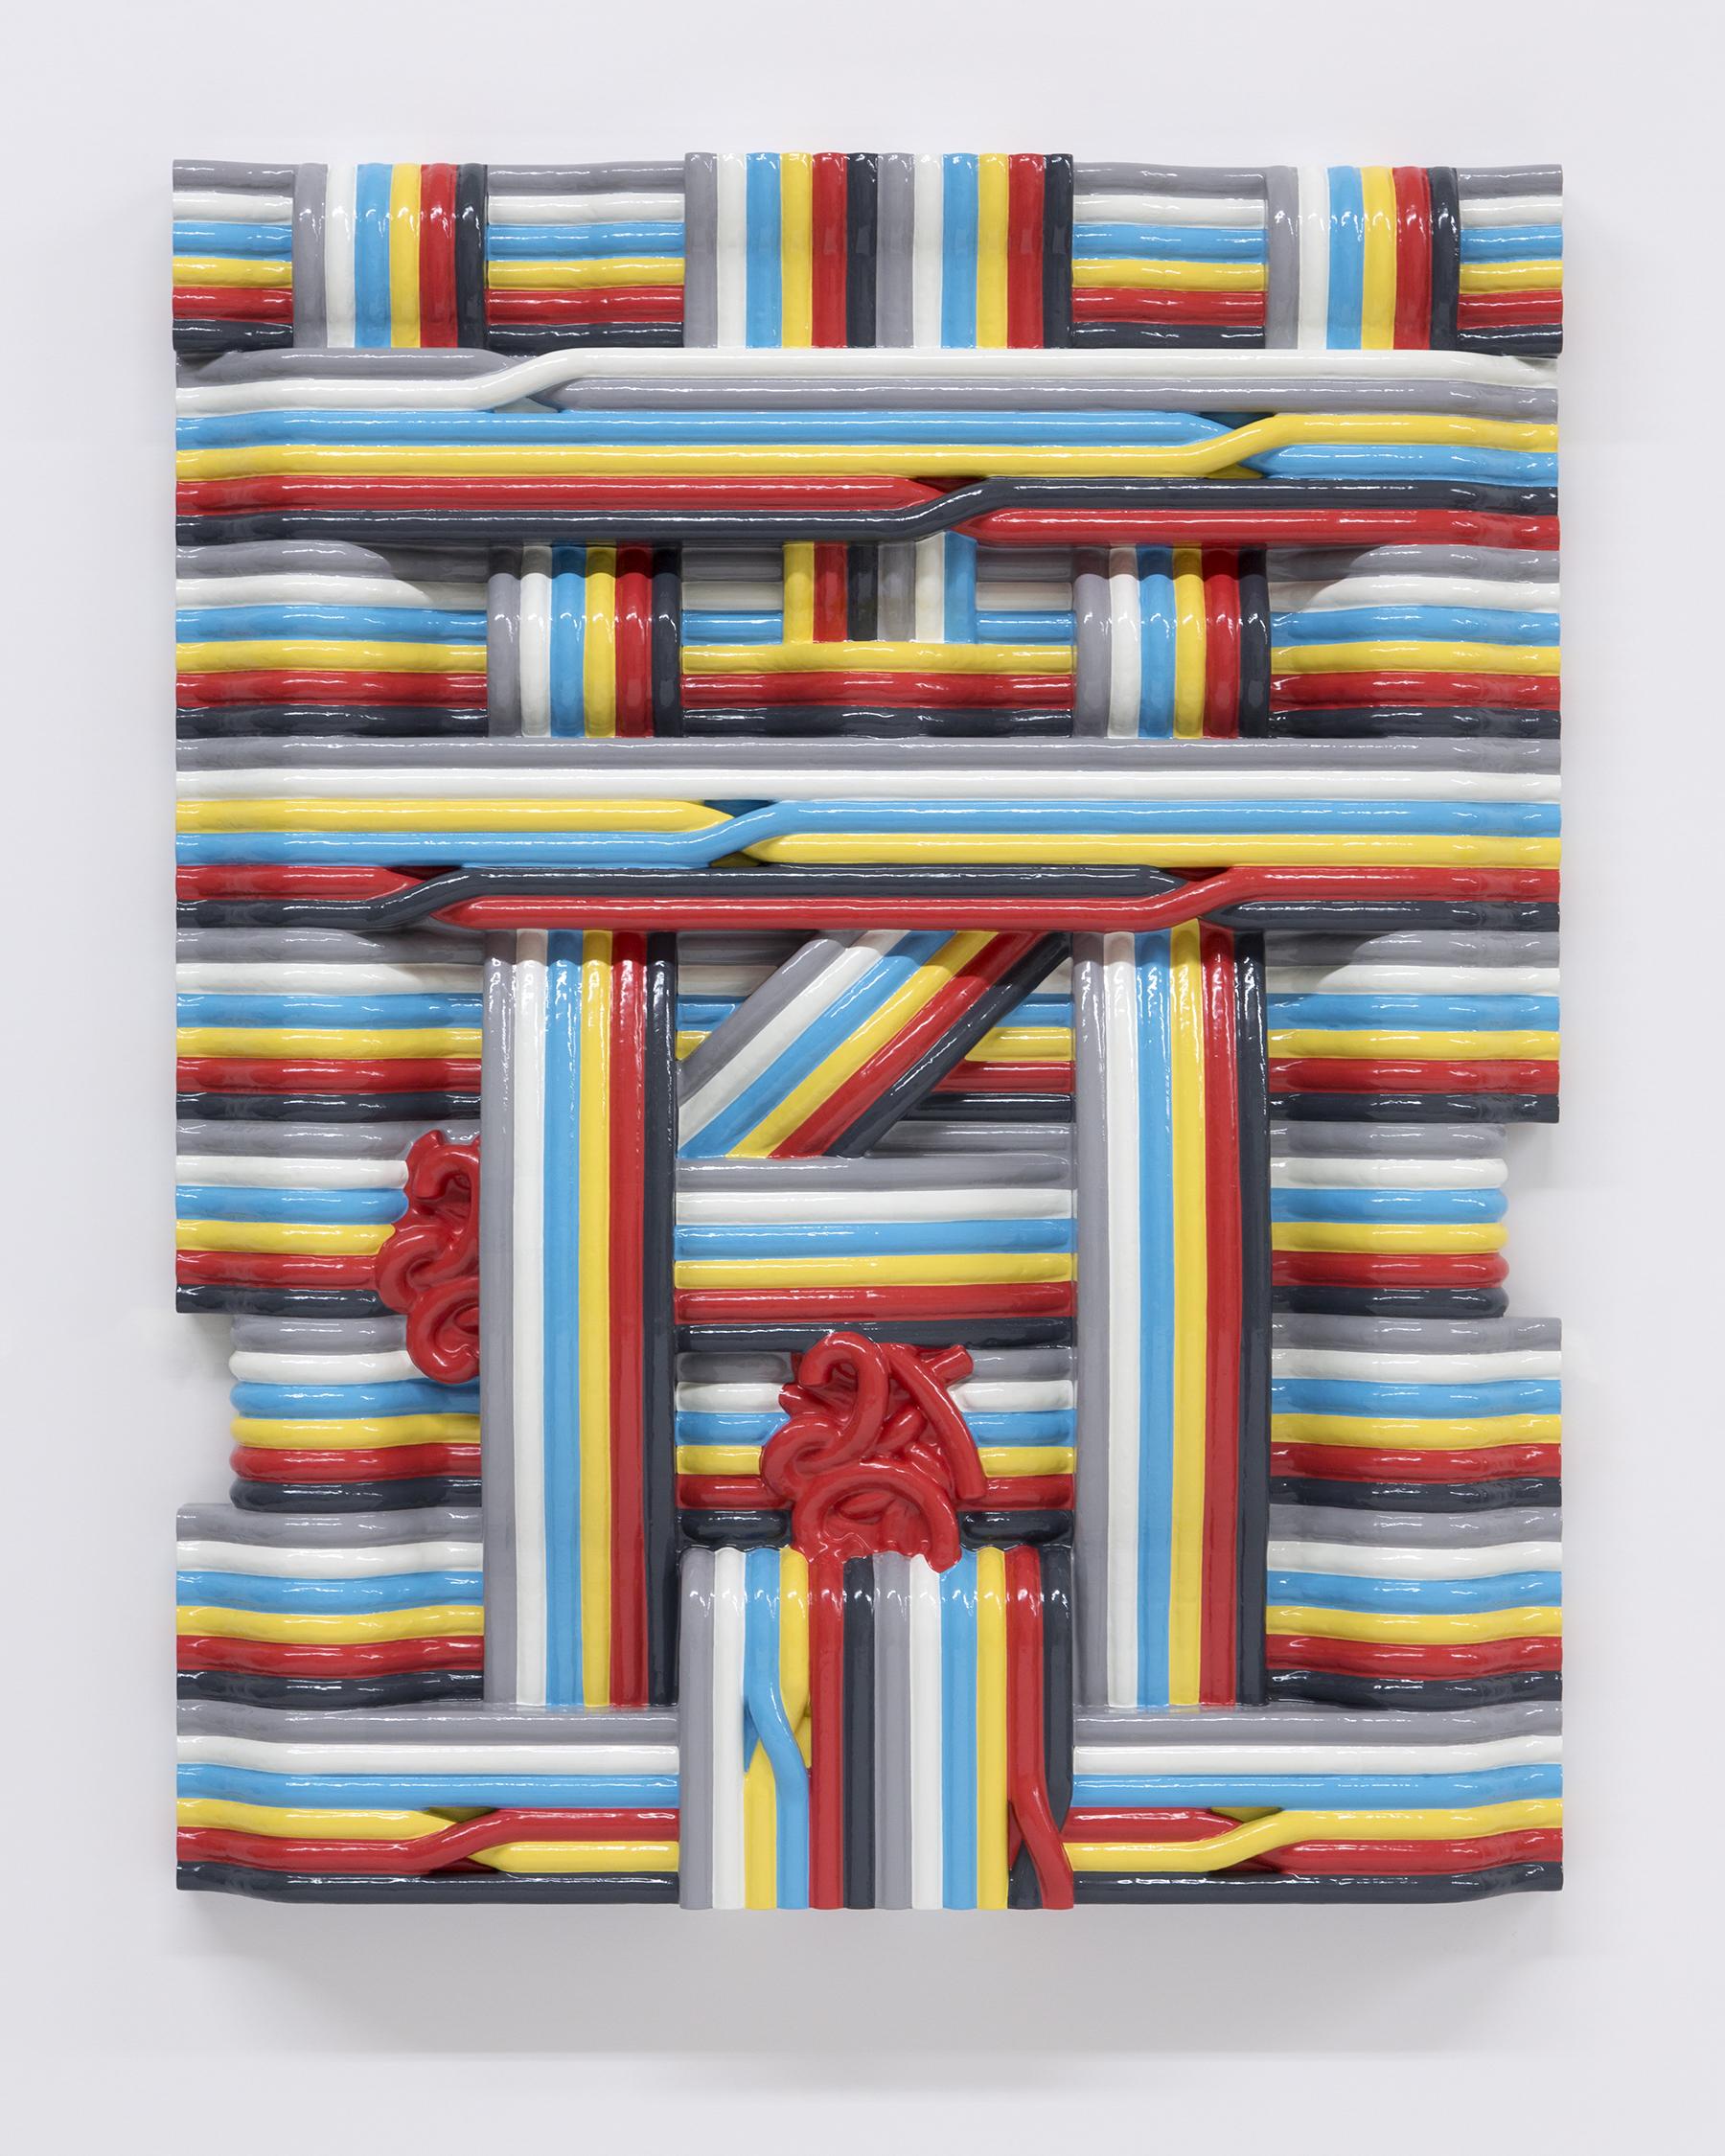 Matthew Palladino_Rainbow Wires_Enamel on resin, plastic and wood_76 x 61 x 8.9 cm_2018.jpg